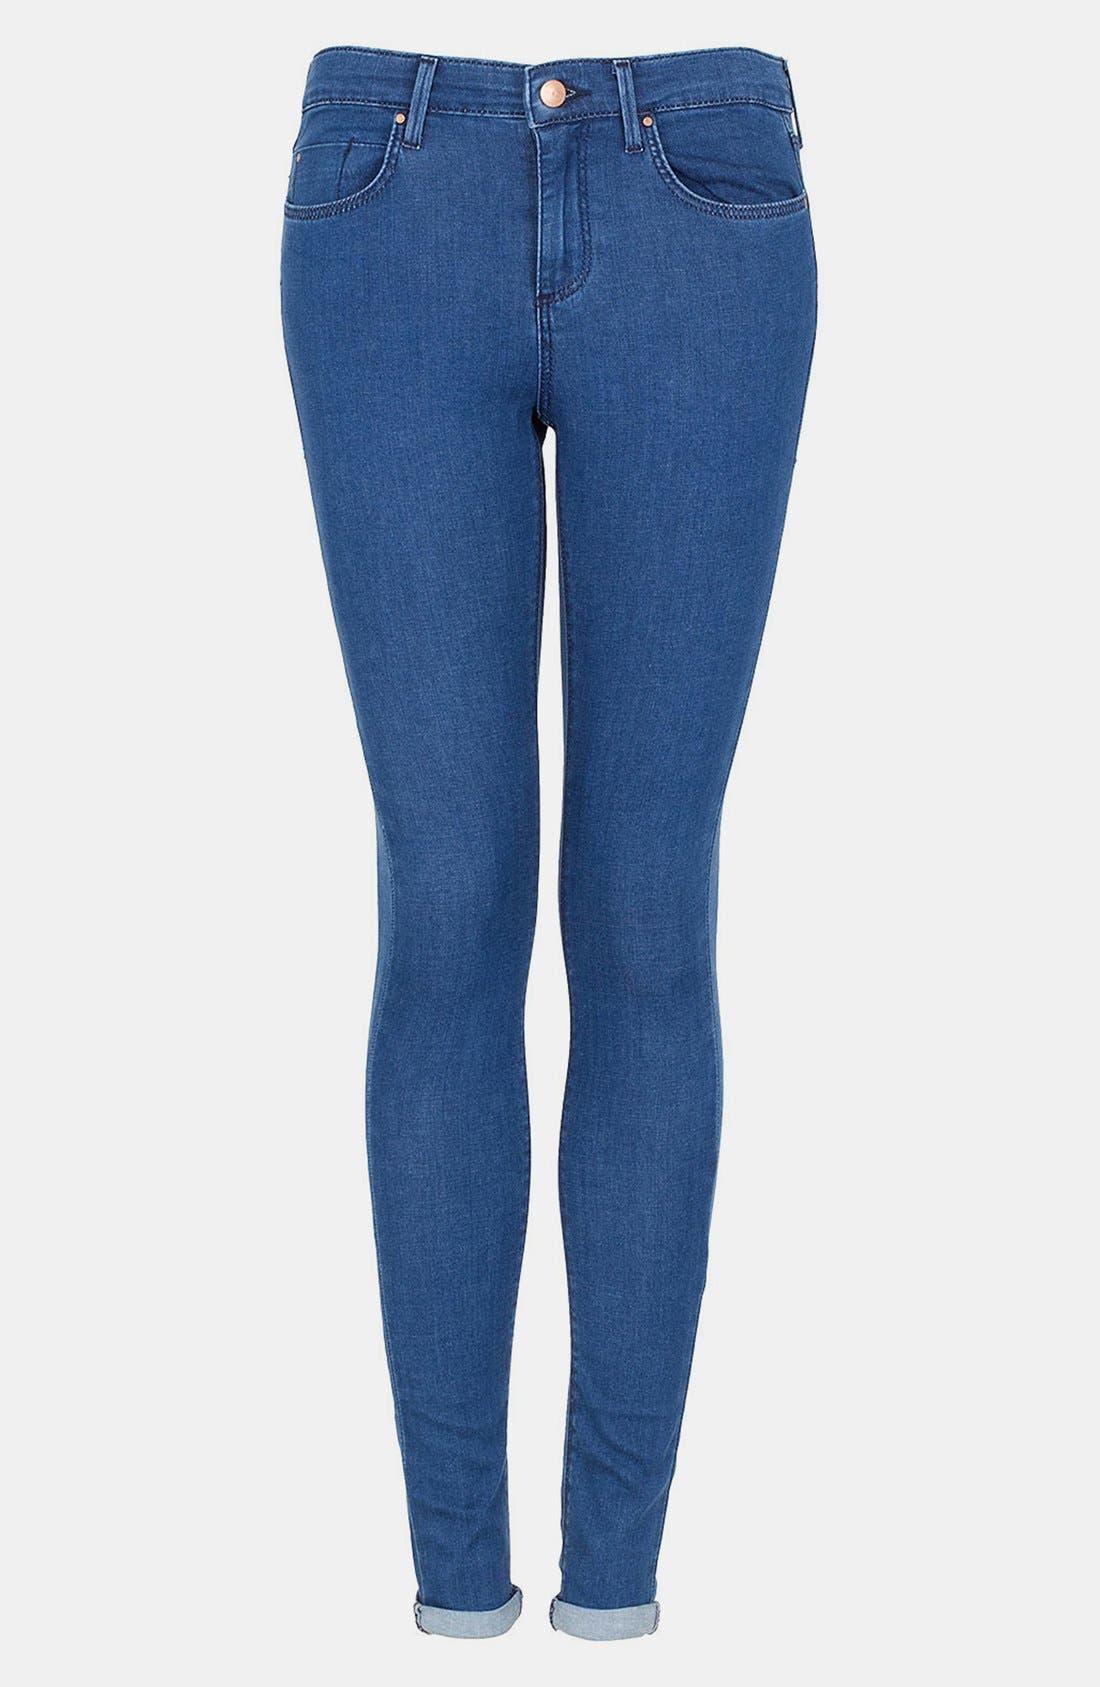 Alternate Image 1 Selected - Topshop Moto 'Leigh' Skinny Jeans (Blue) (Short)